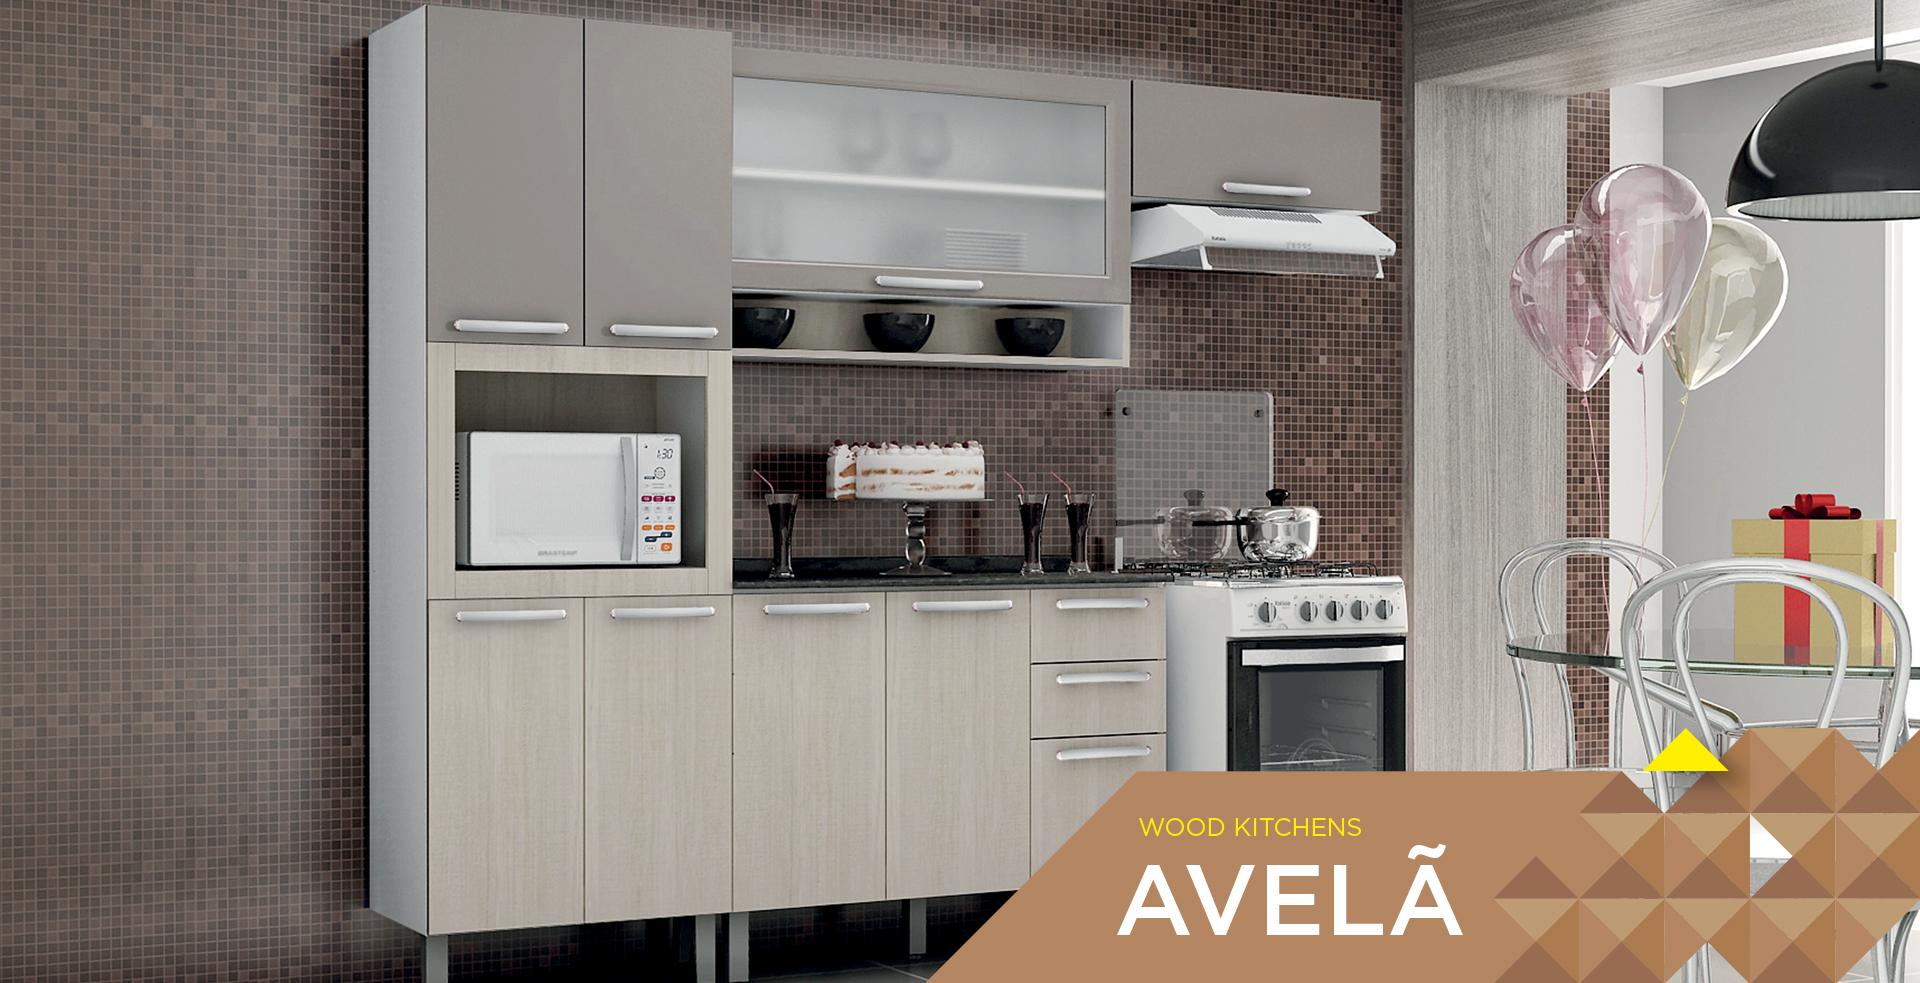 Wooden Kitchens Avelã | Cozinhas Itatiaia